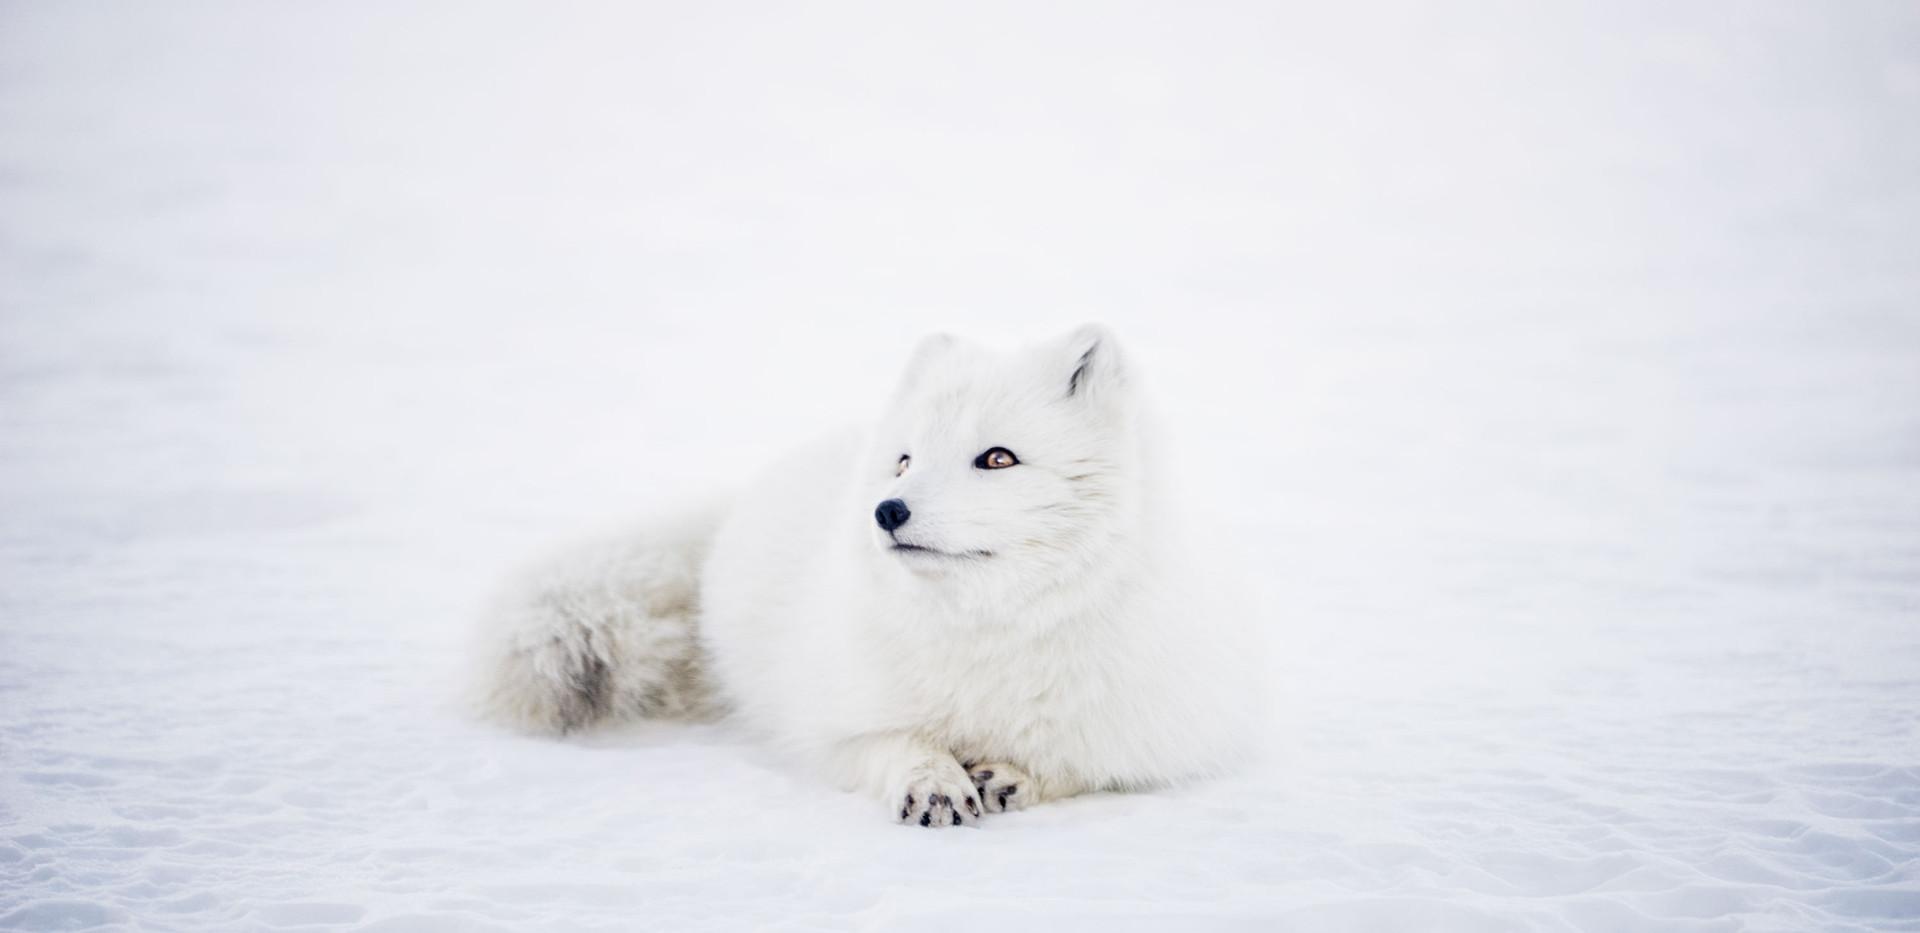 Inspiration - White Snow